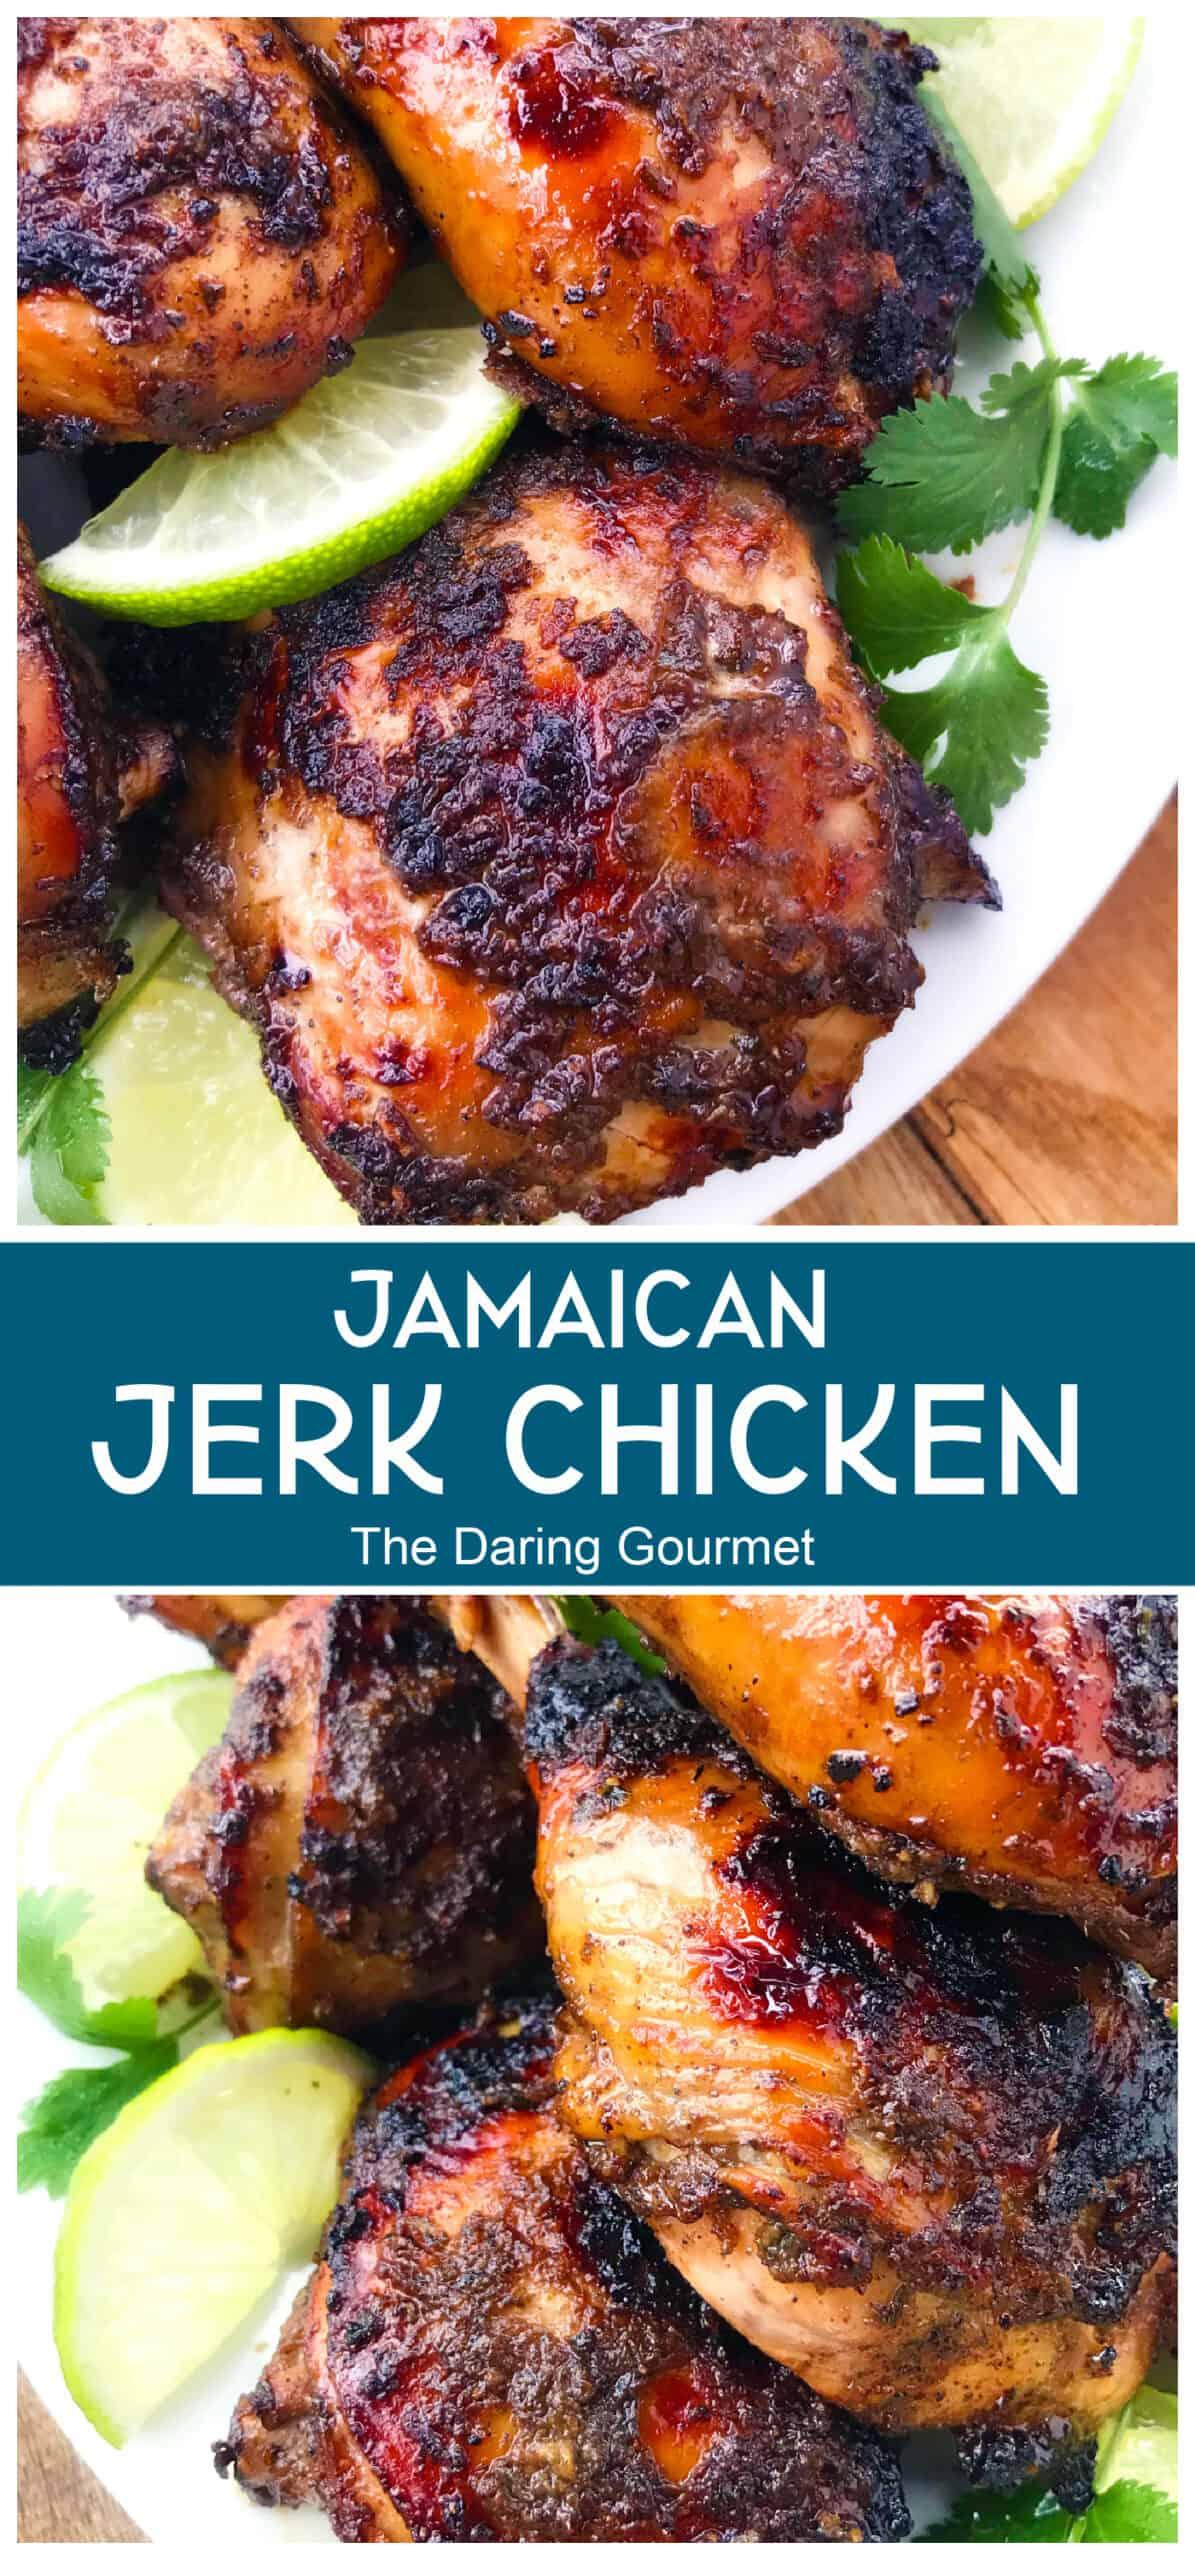 jerk chicken recipe jamaican caribbean best traditional authentic